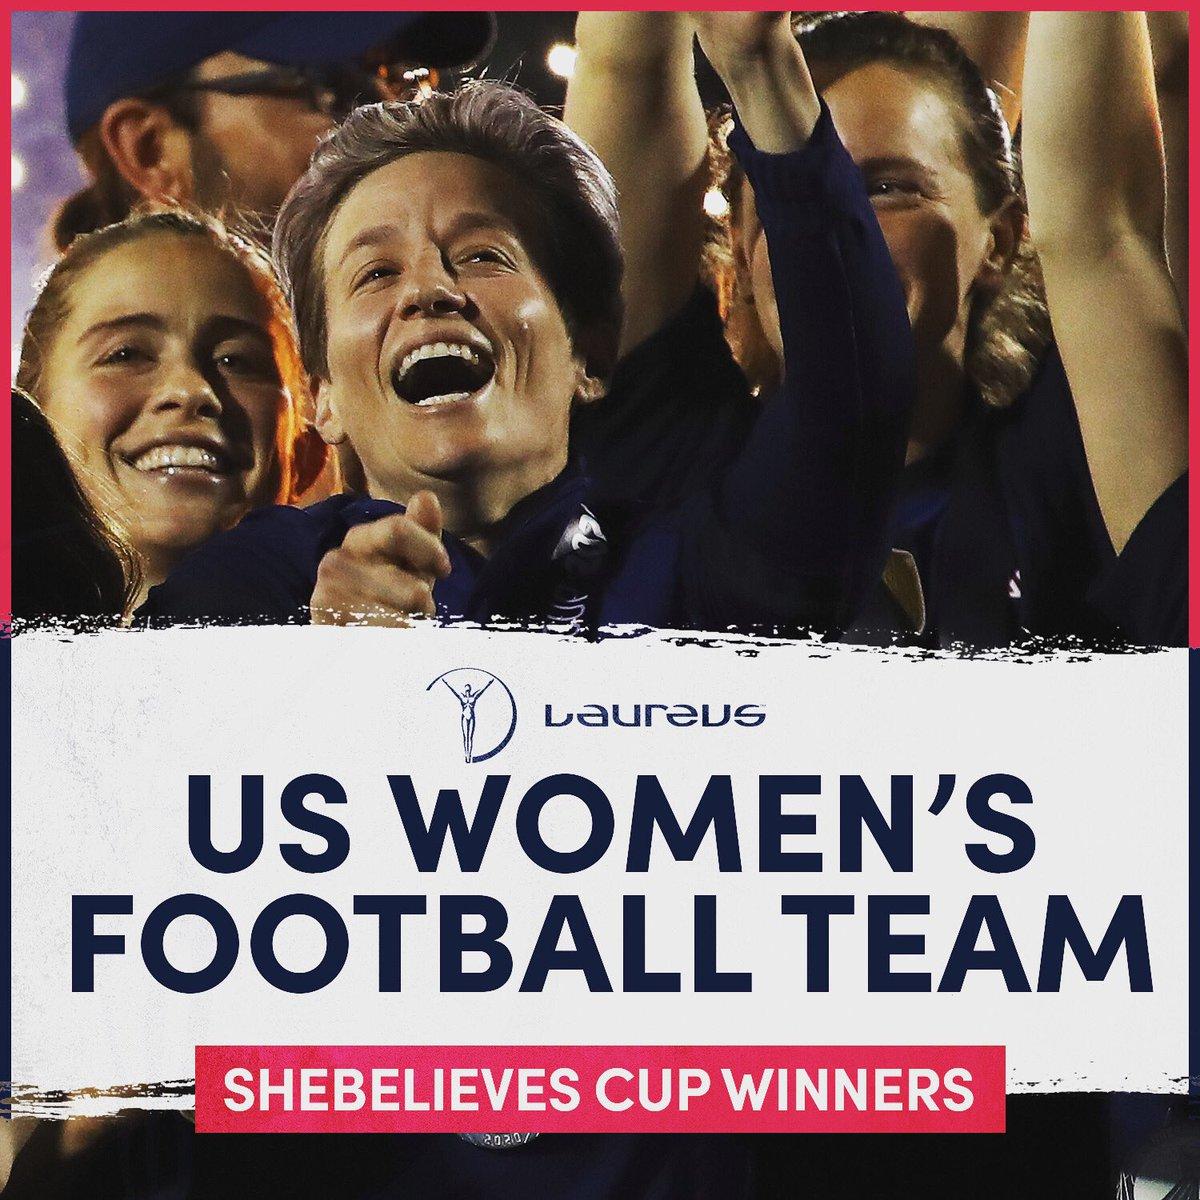 🏆🇺🇸  Congratulations to Laureus World Team of the Year nominee @USWNT and Laureus World Sportswoman of the Year nominee @mPinoe on winning the #SheBelievesCup2020   #USWNT #USA #SportUnitesUs